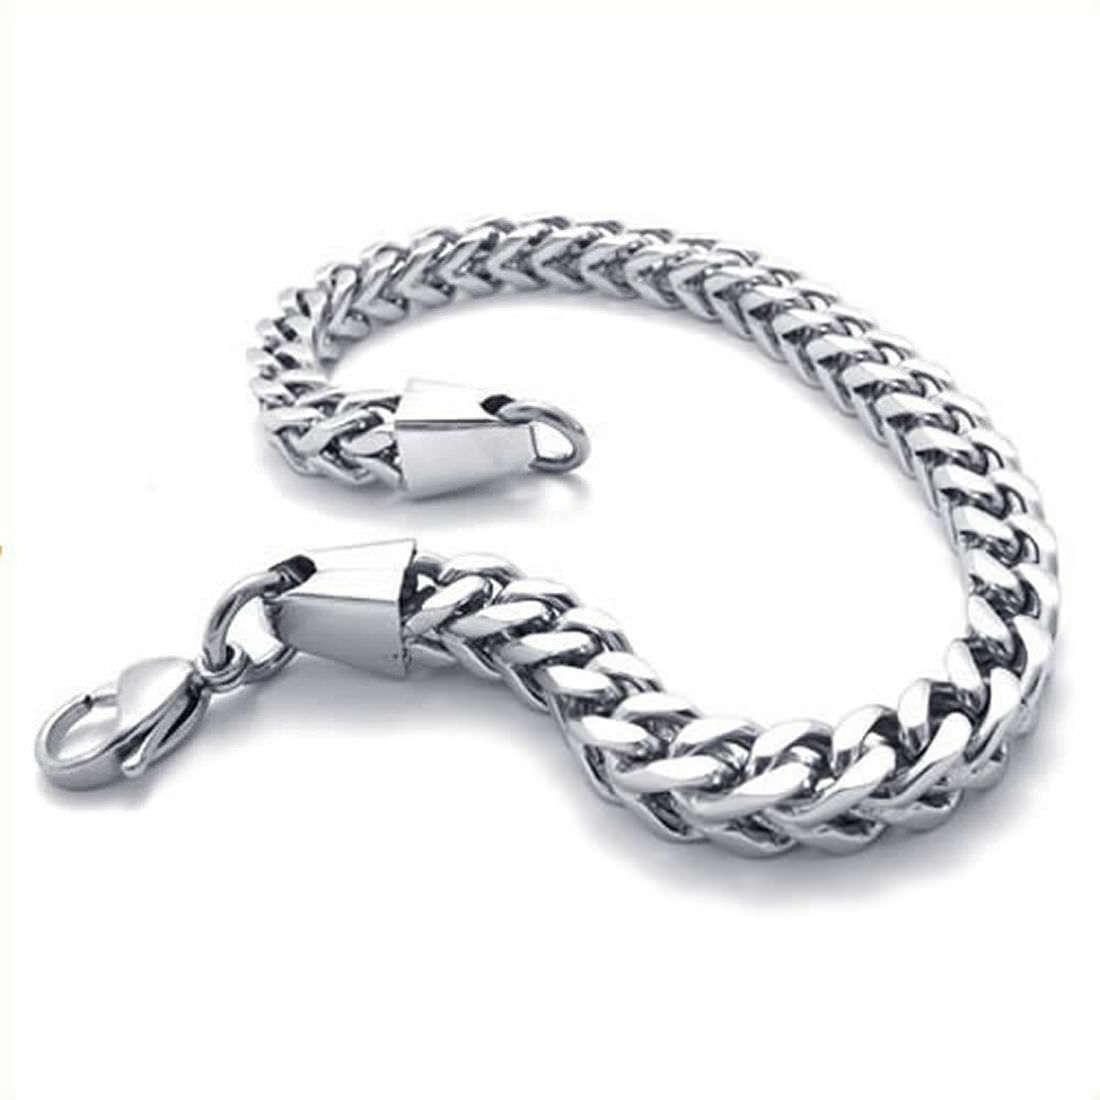 Armband aus grauem Baumwolle Kompass auf Kreuzknoten Edelstahl Armschmuck 21cm